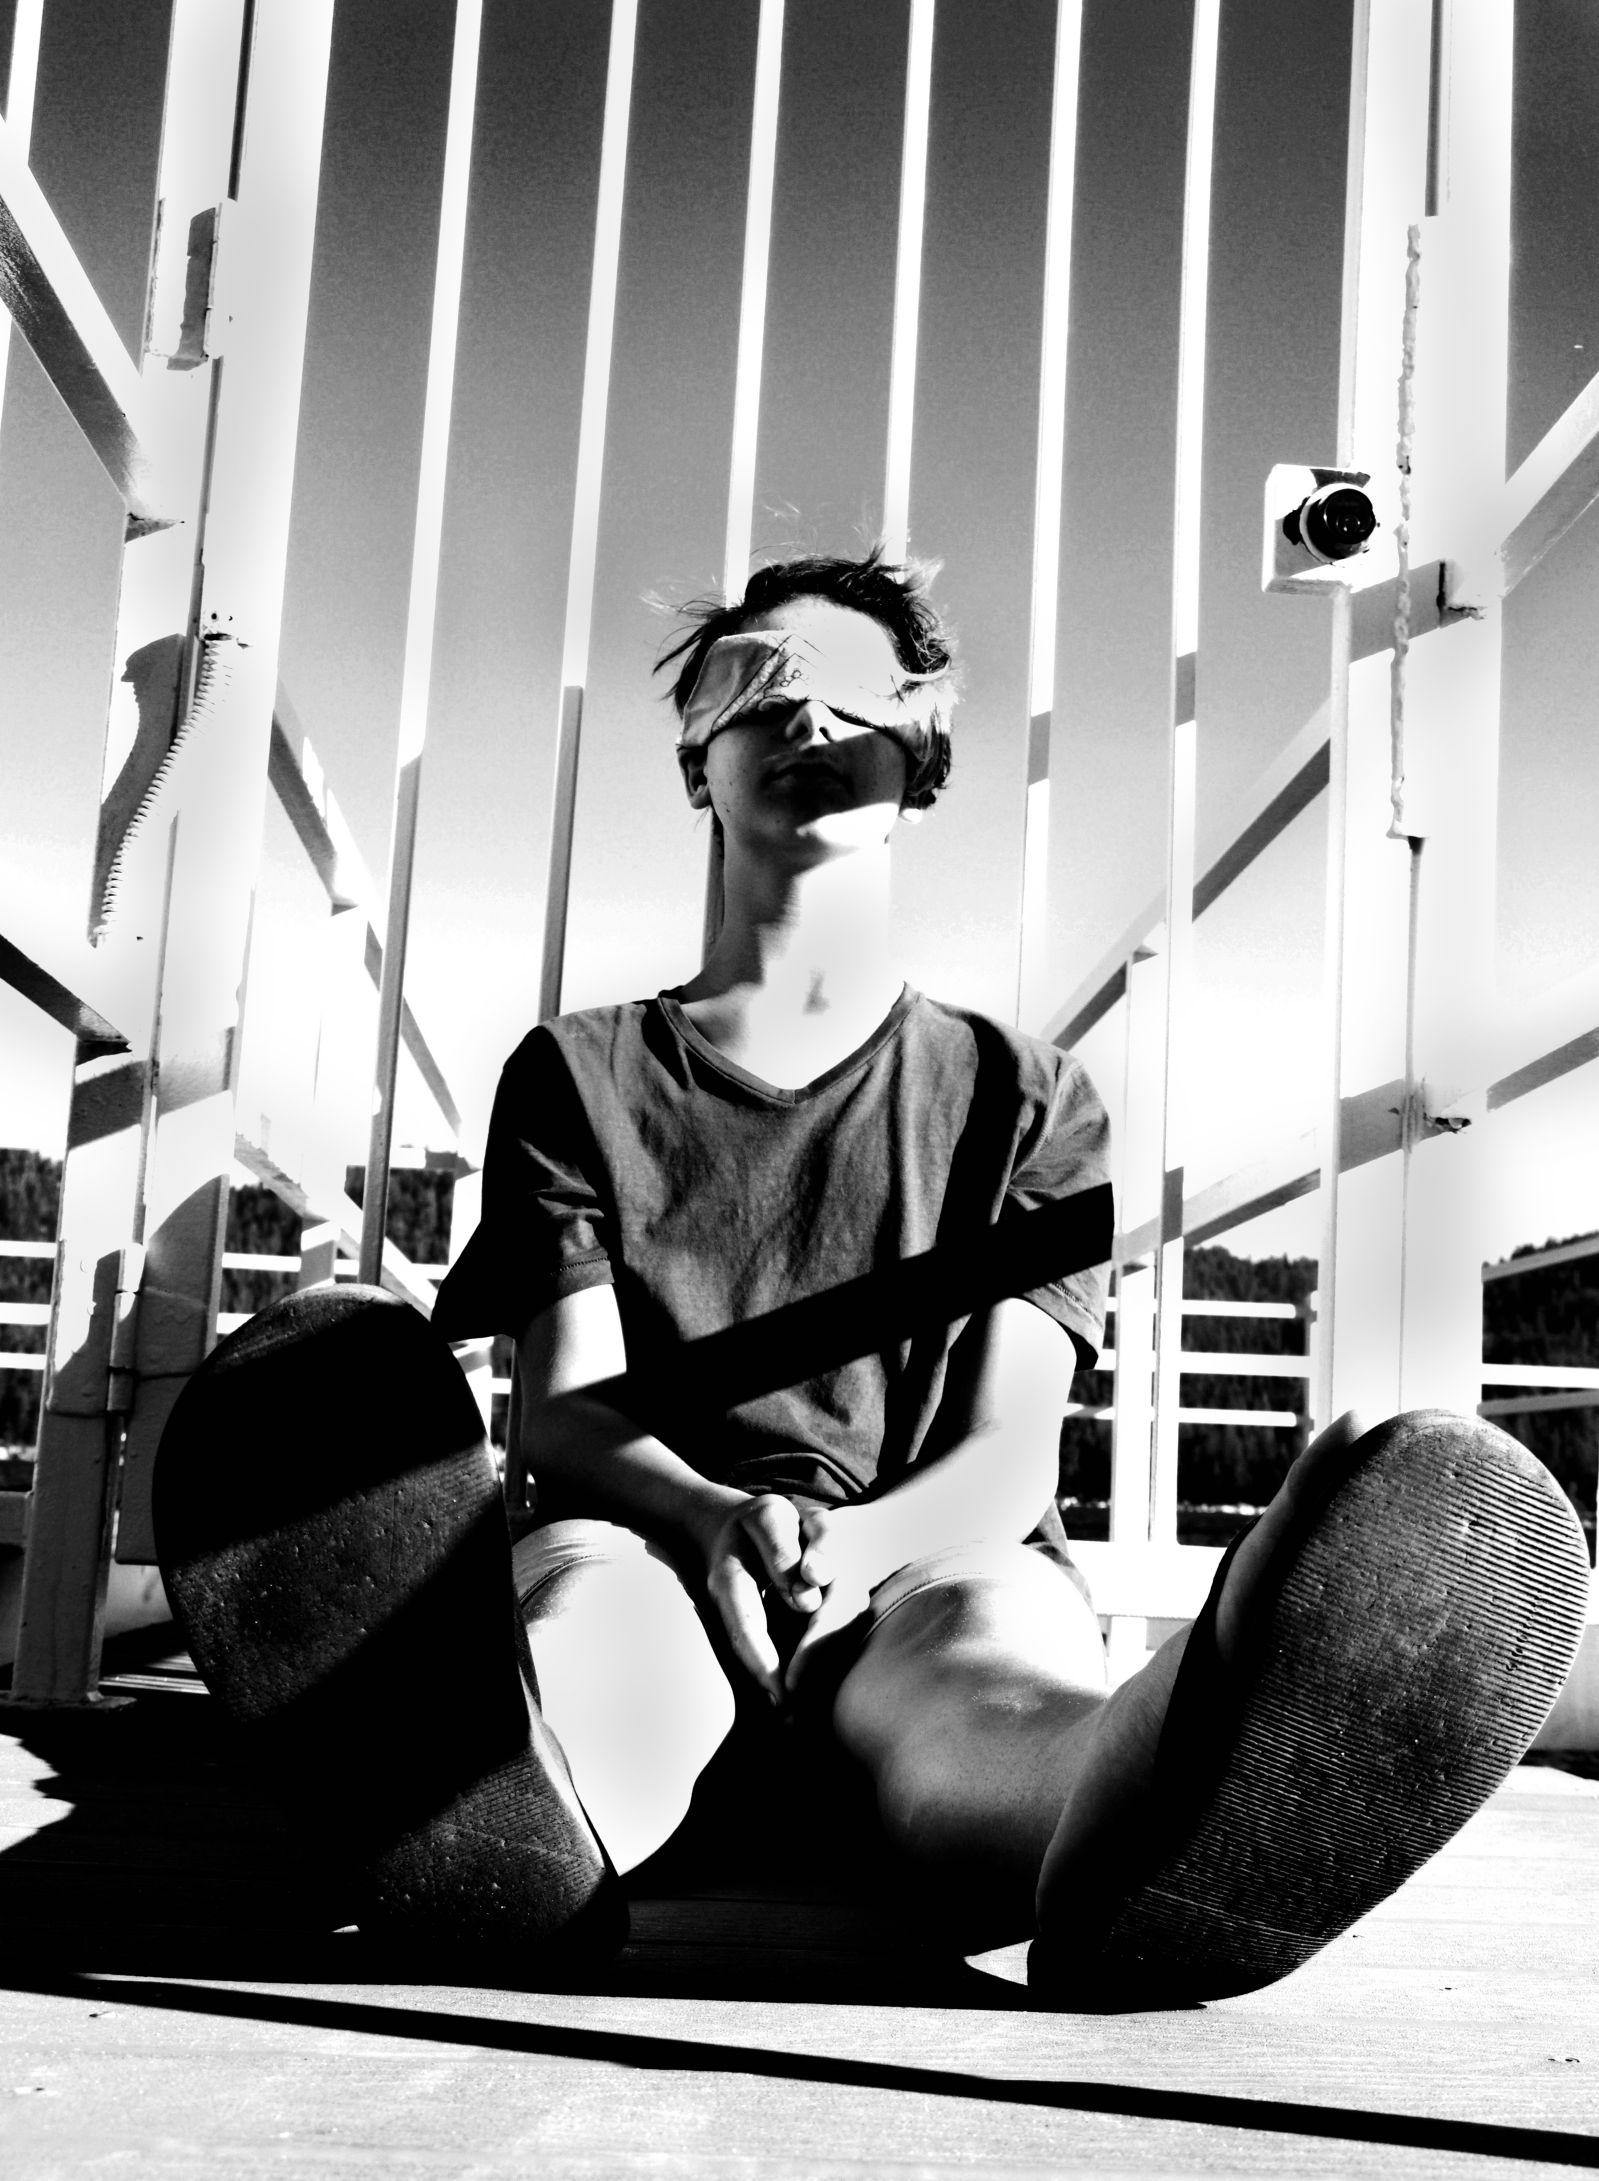 Max_bars_bw.jpg